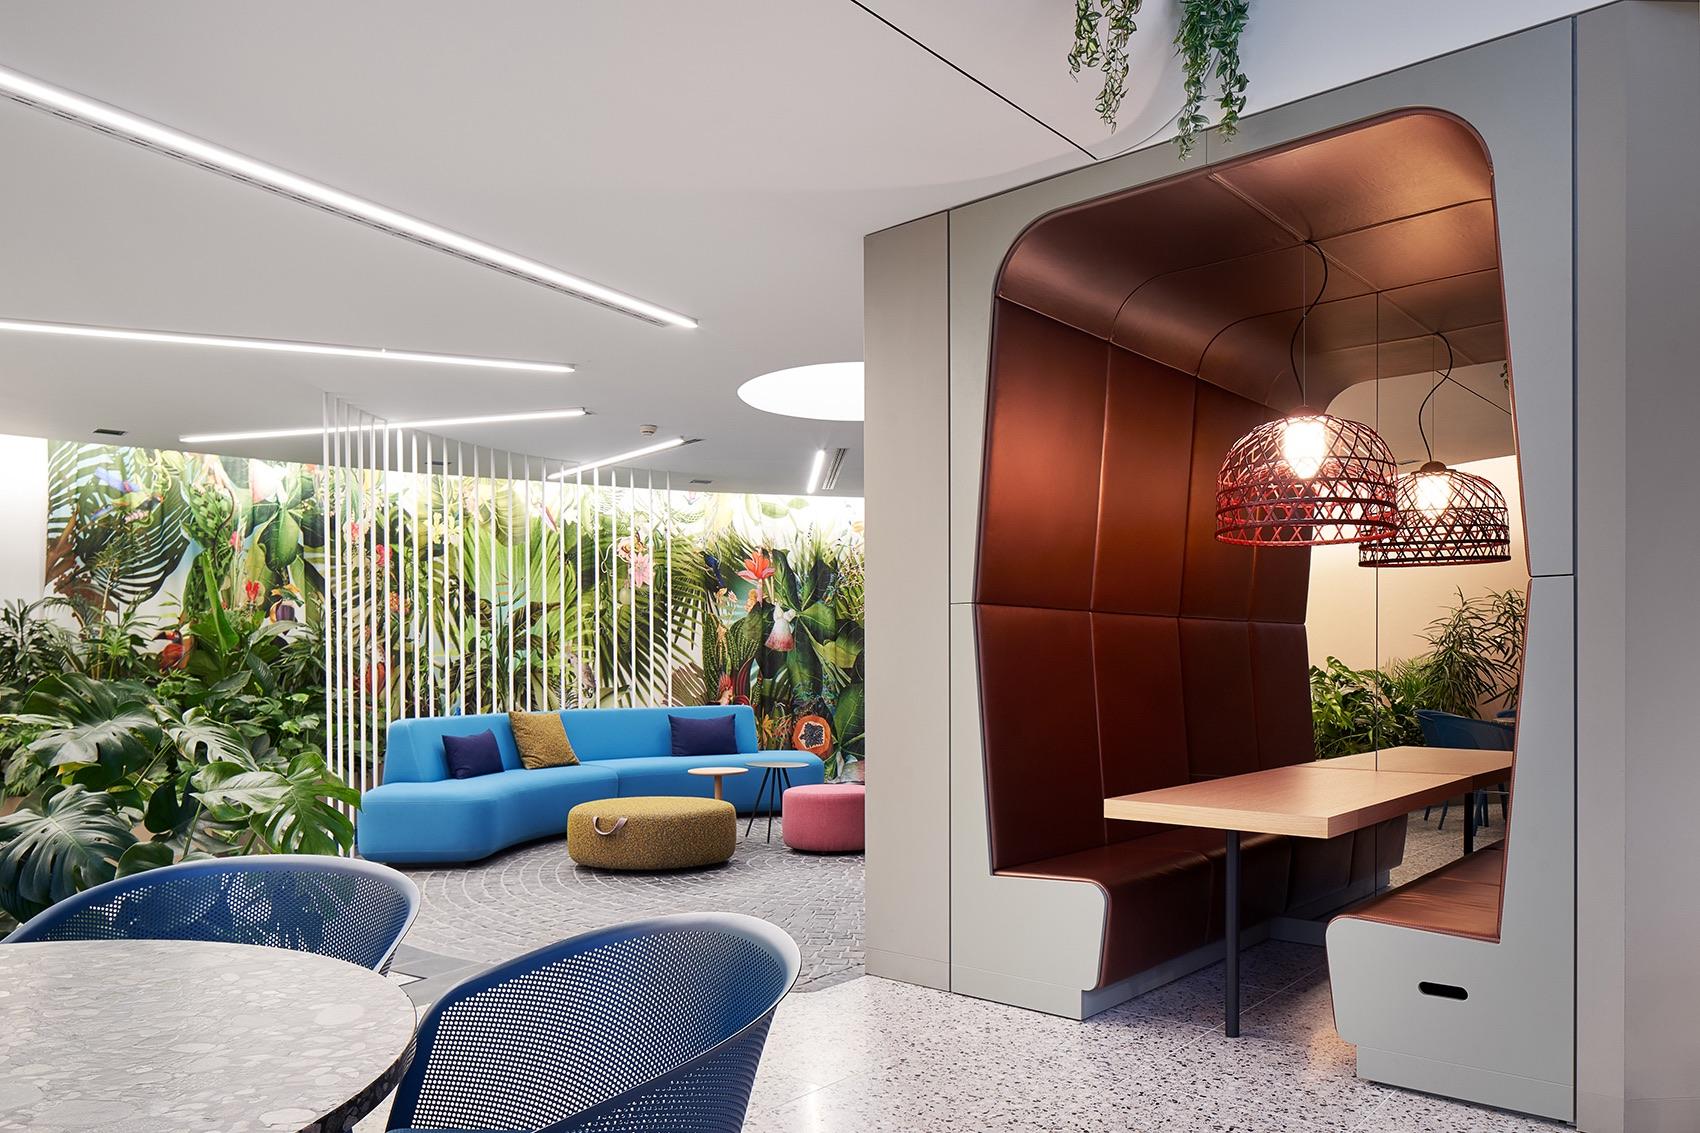 roman-klis-design-office-15